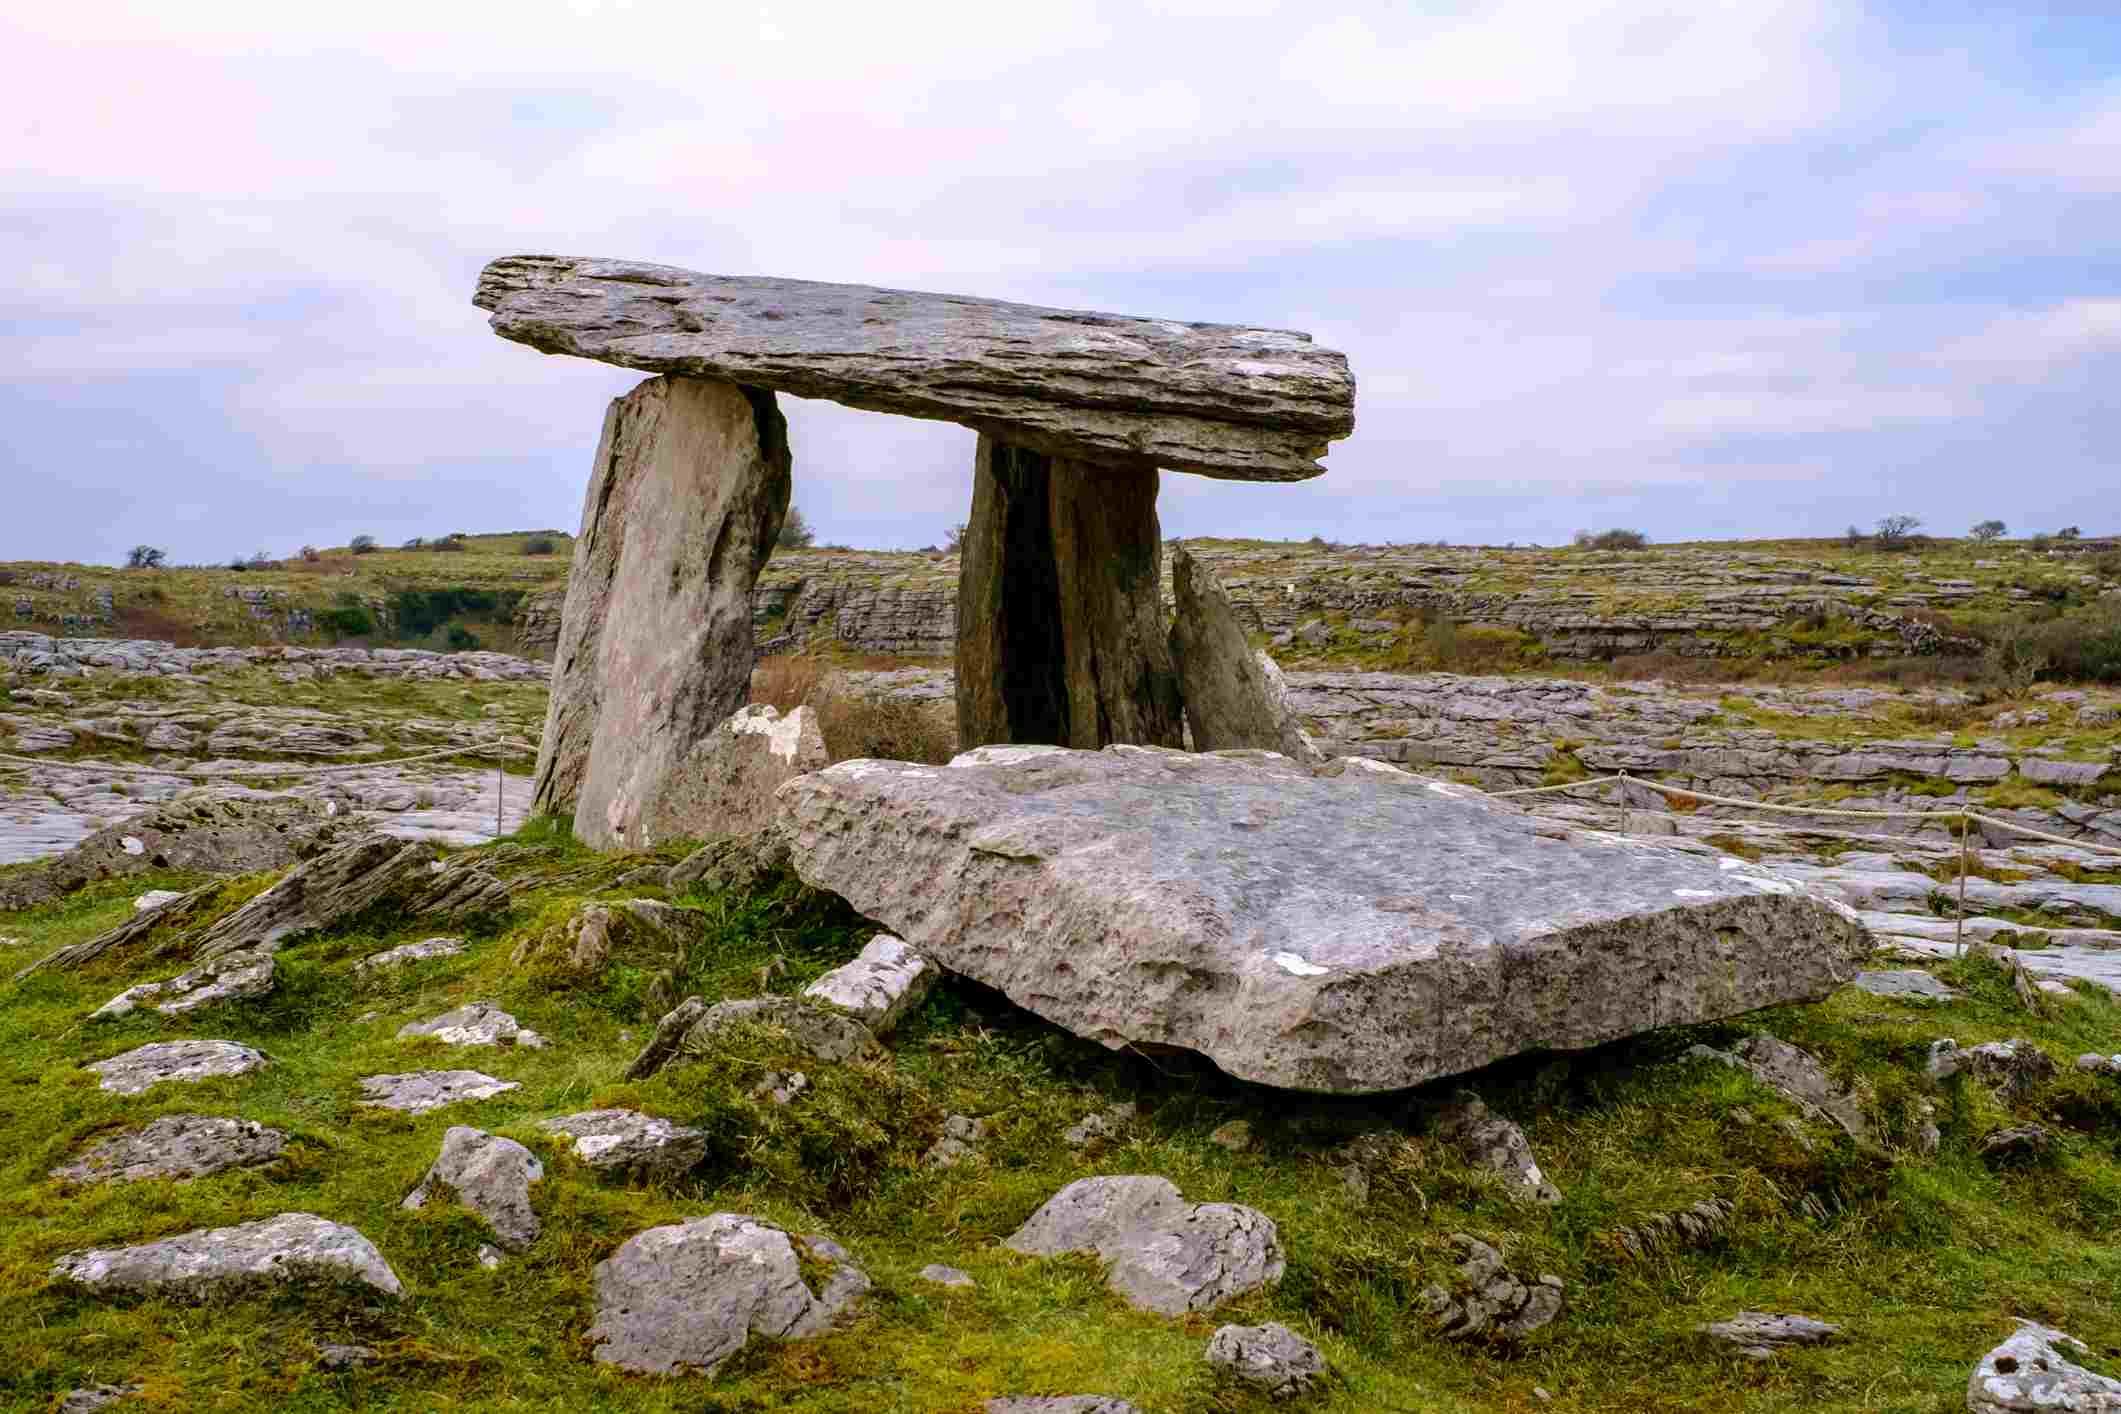 Portal tomb, Poulnabrone dolmen, in the Burren